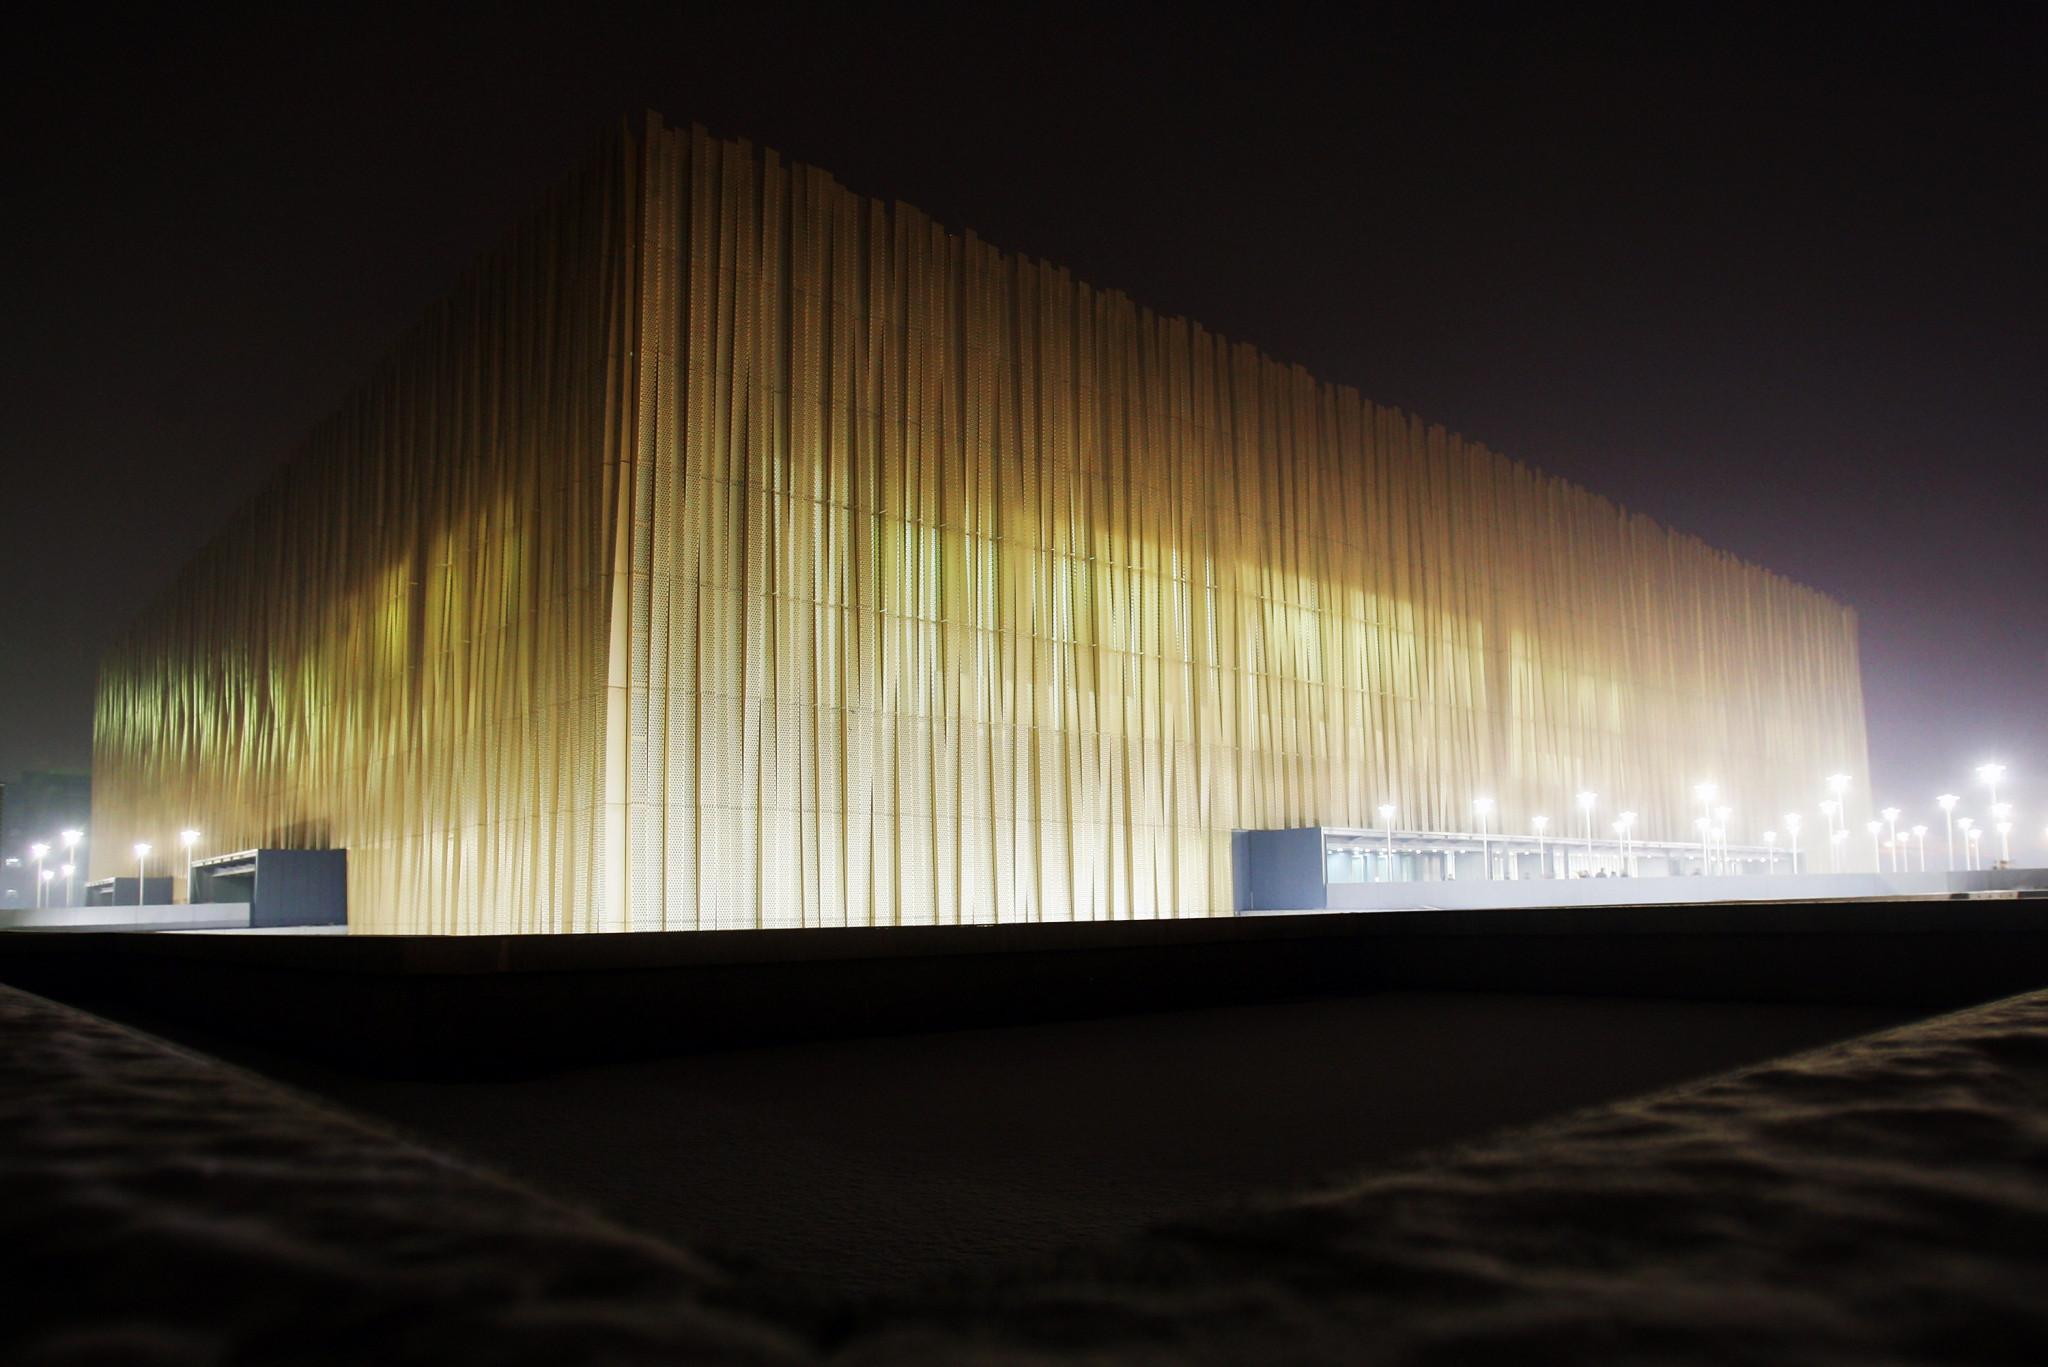 Work begins upgrading Beijing 2022 ice hockey venue